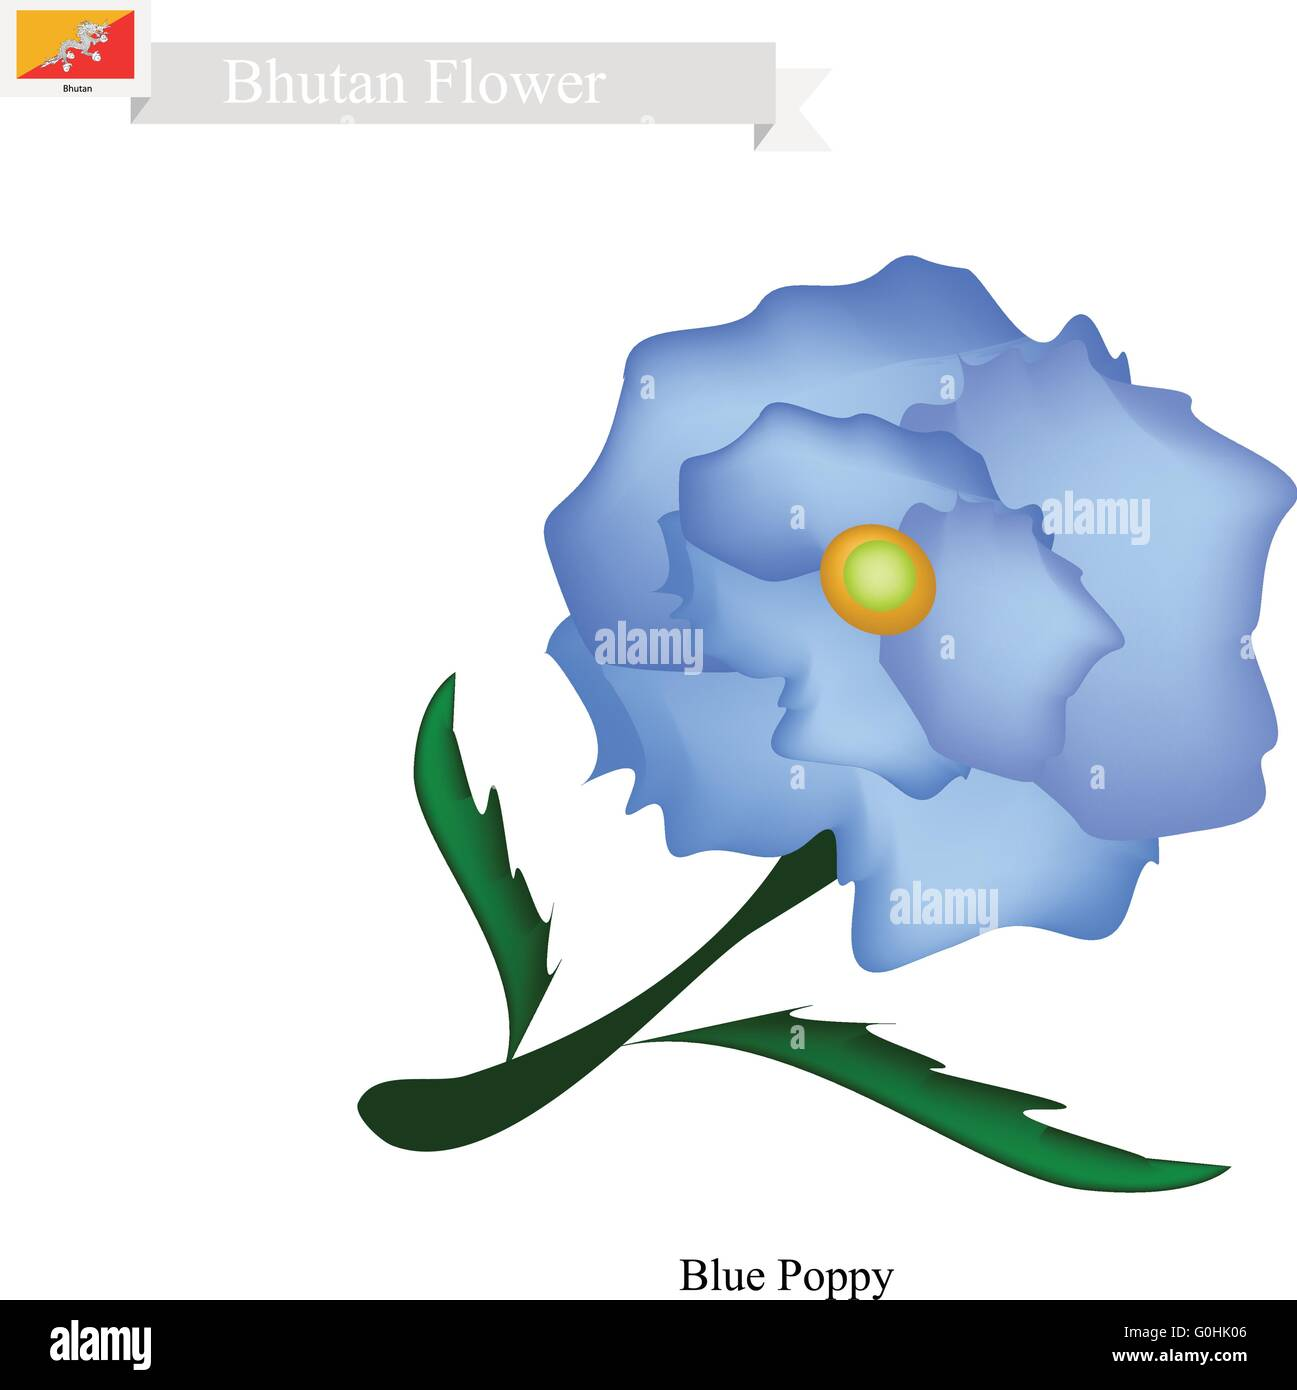 Bhutan Flower, Illustration of Blue Poppy, Himalayan Poppy, or Meconopsis Sheldonnii Flower. The National Flower - Stock Vector